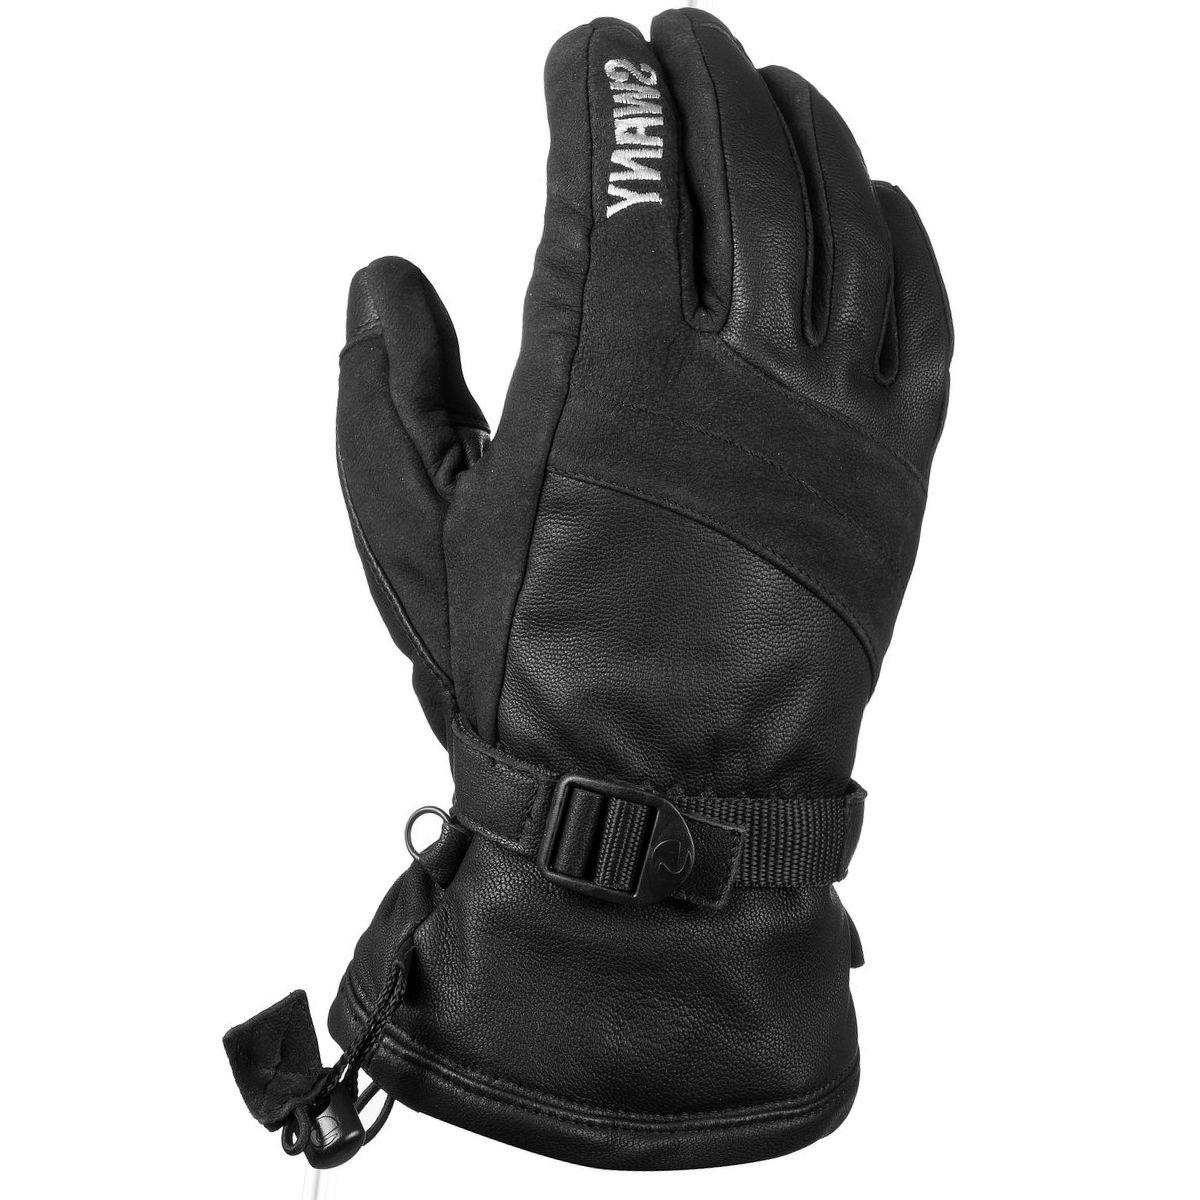 Swany Gore Explorer Glove - Men's